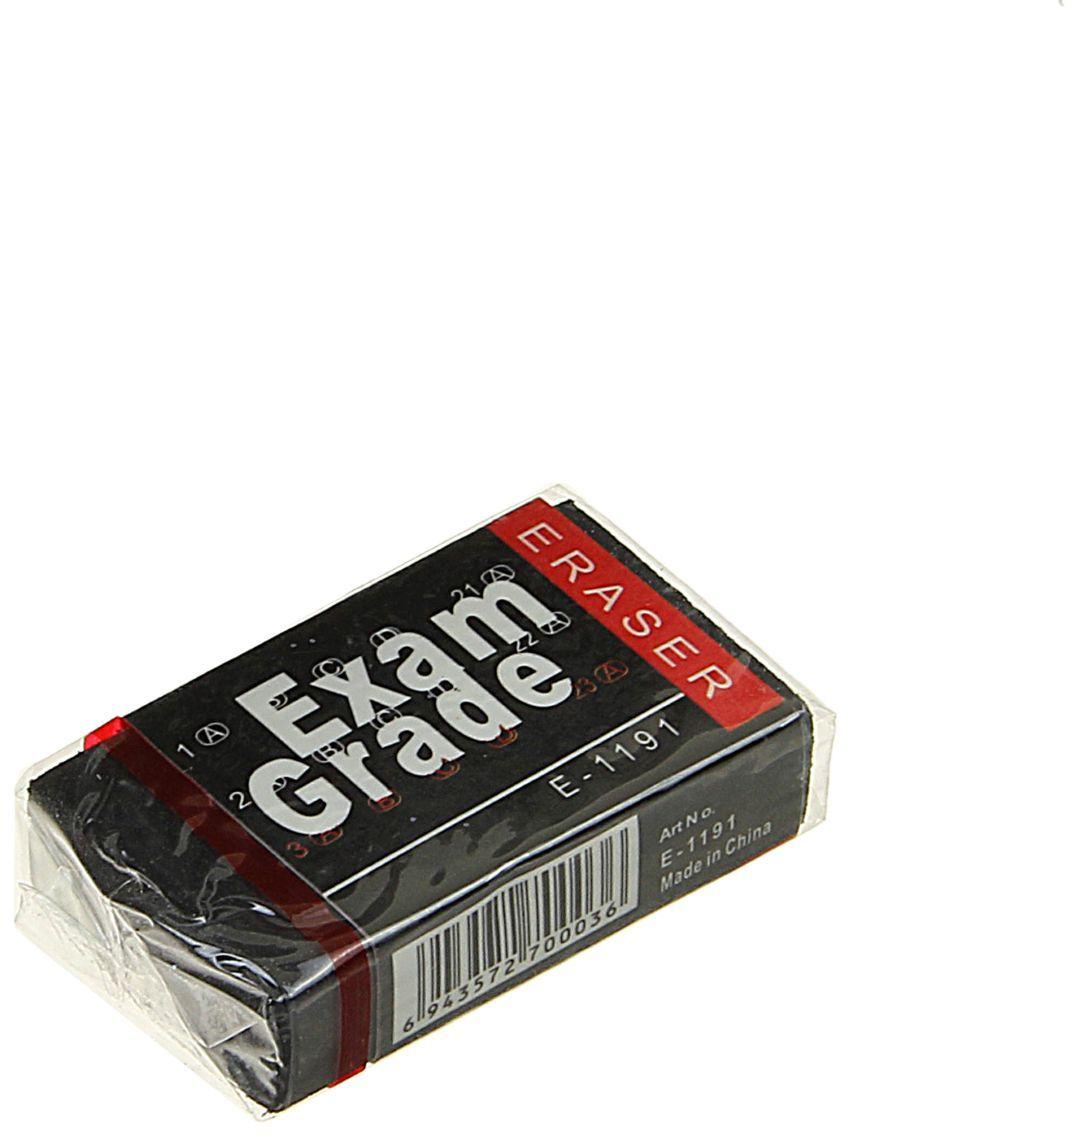 Exam Grade Ластик цвет черный1403244